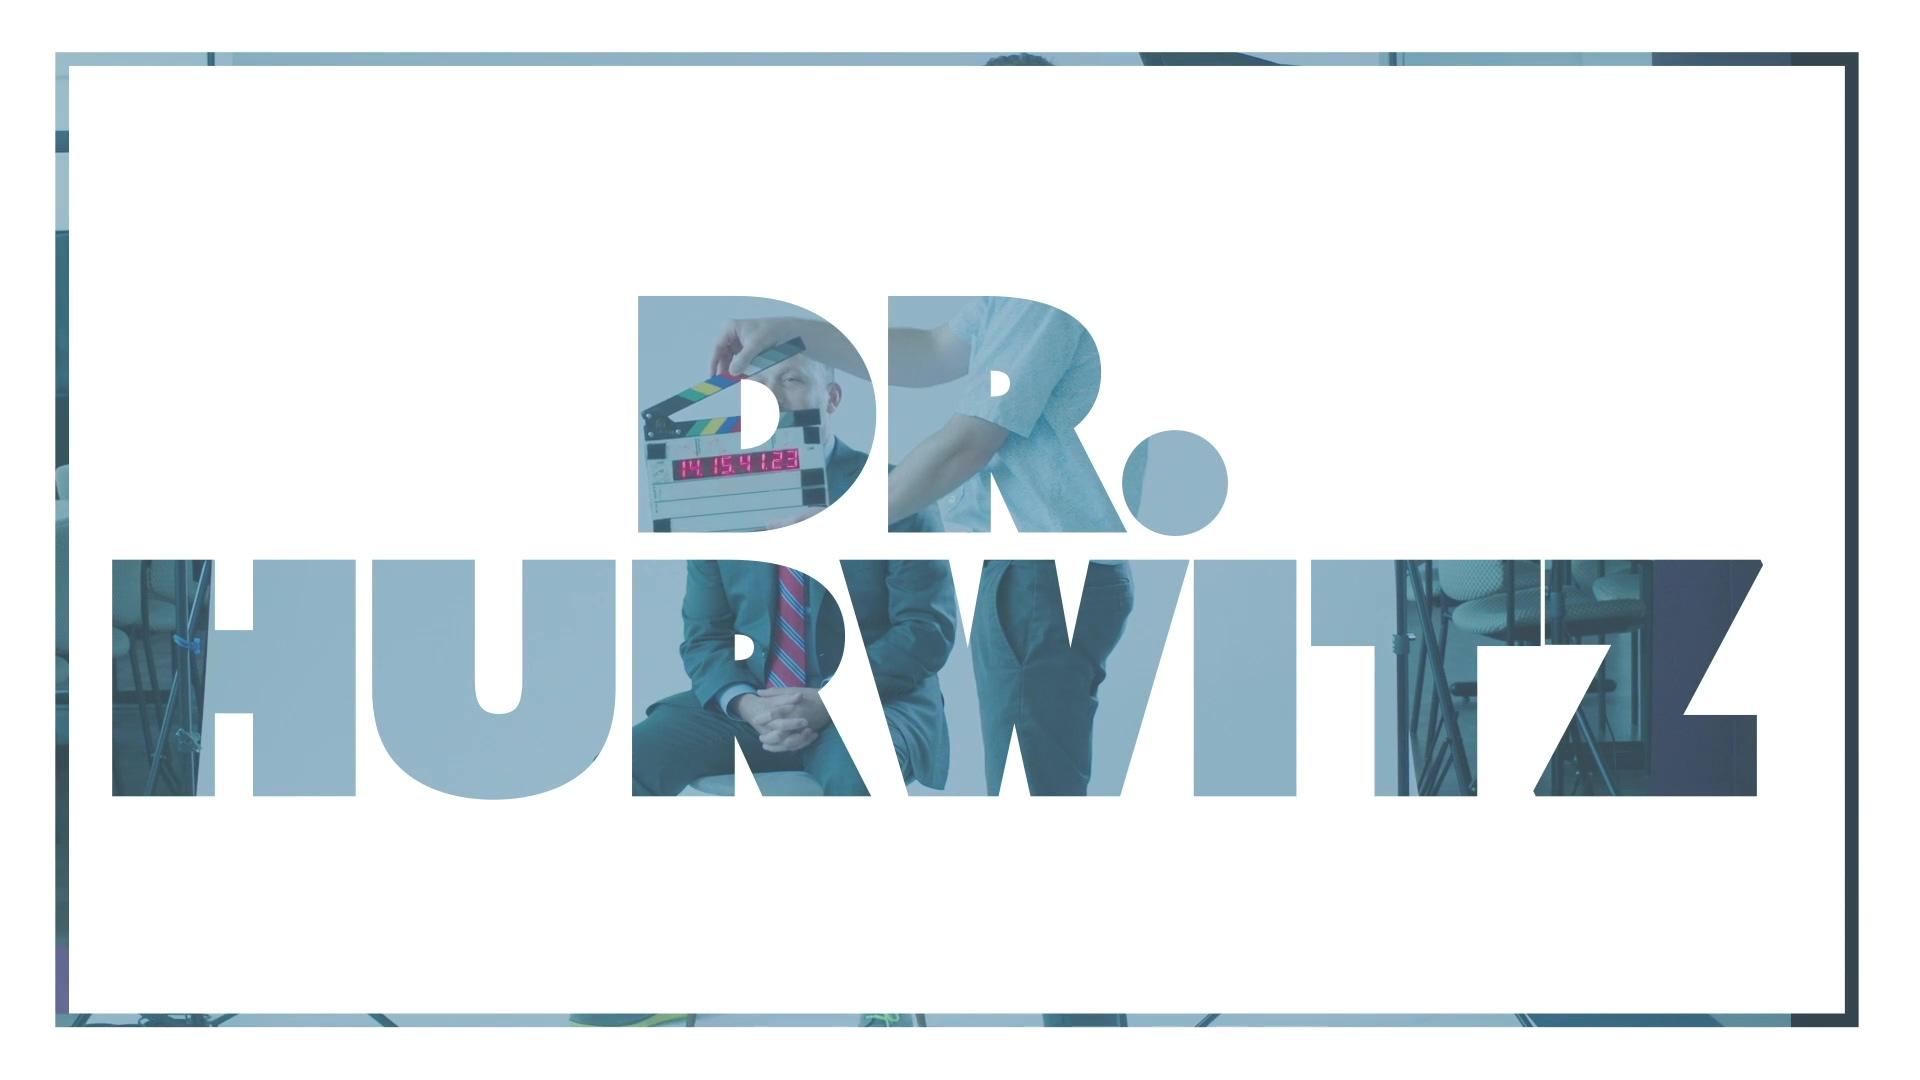 BioVideo DrHurwitz FullLength withcaptions 16x9 v1